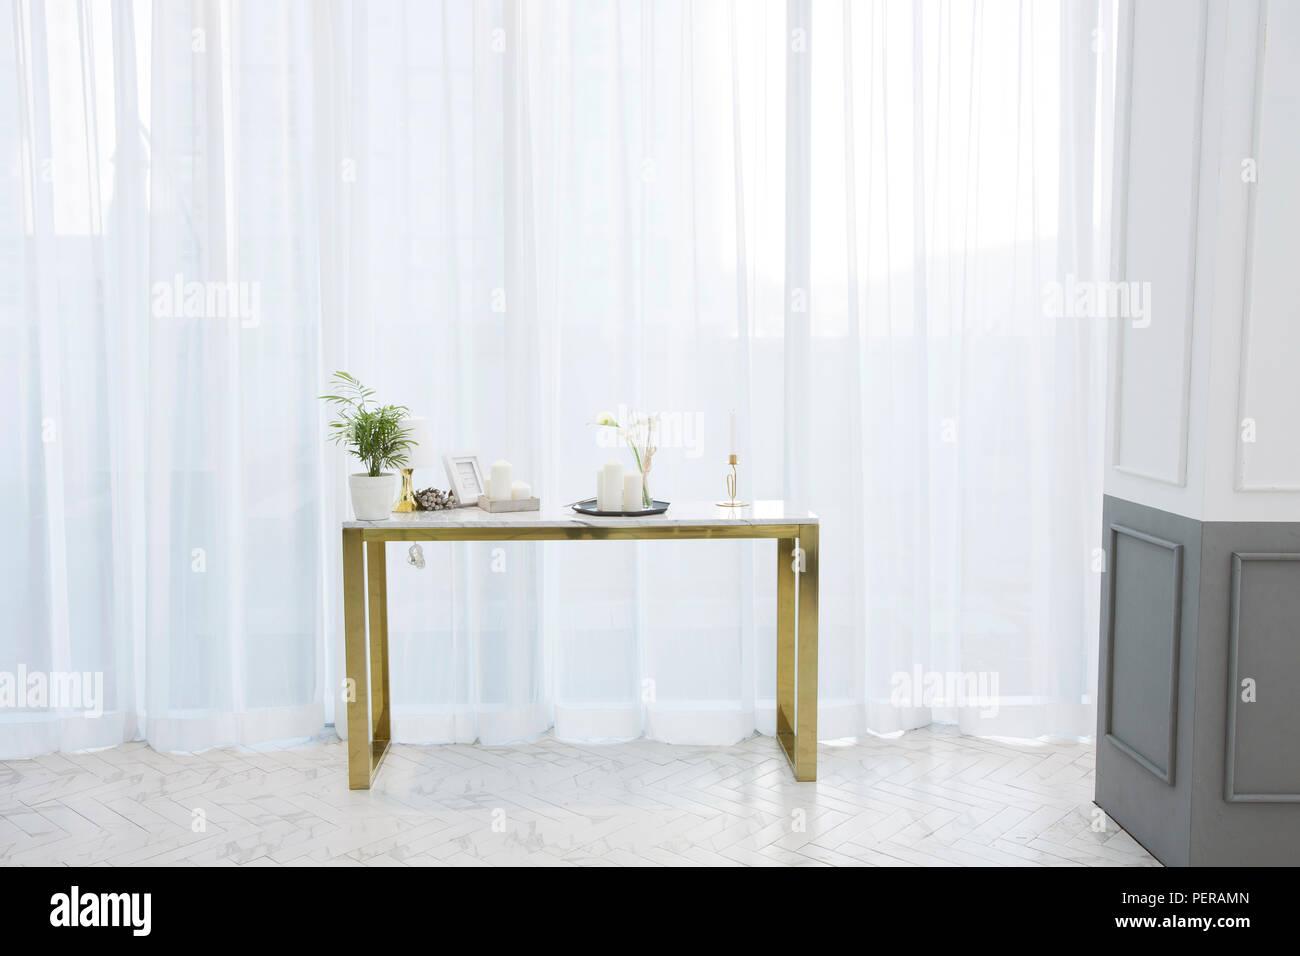 Modern Space Interiors Design Stock Photo Living Room Office Room Restaurant And Hair Salon 019 Stock Photo Alamy